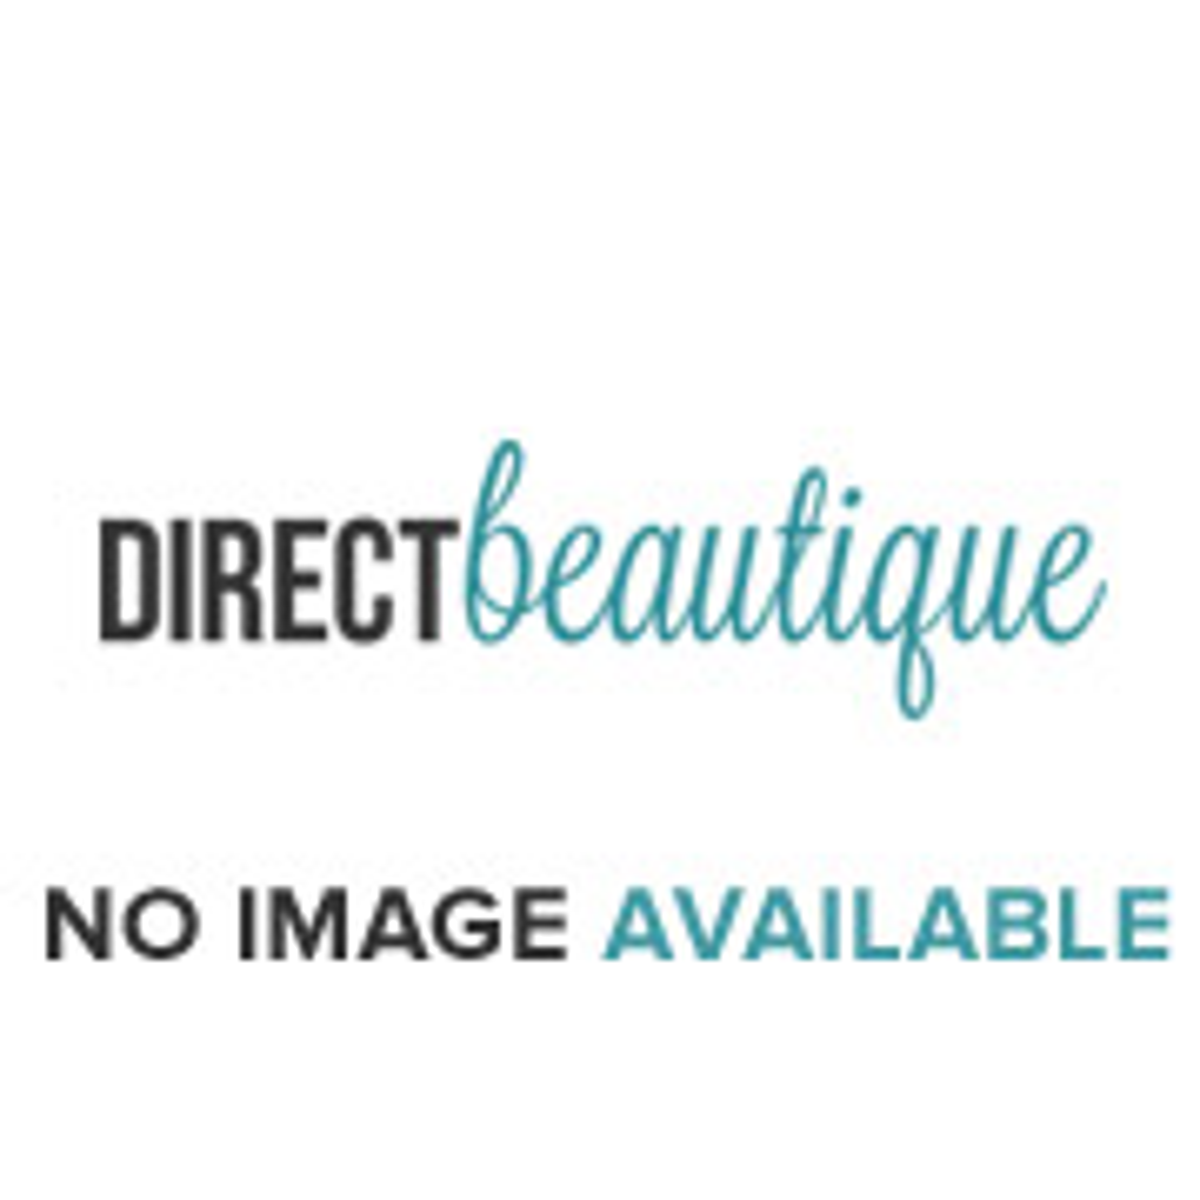 Paris Hilton Passport in South Beach 100ml EDT Spray